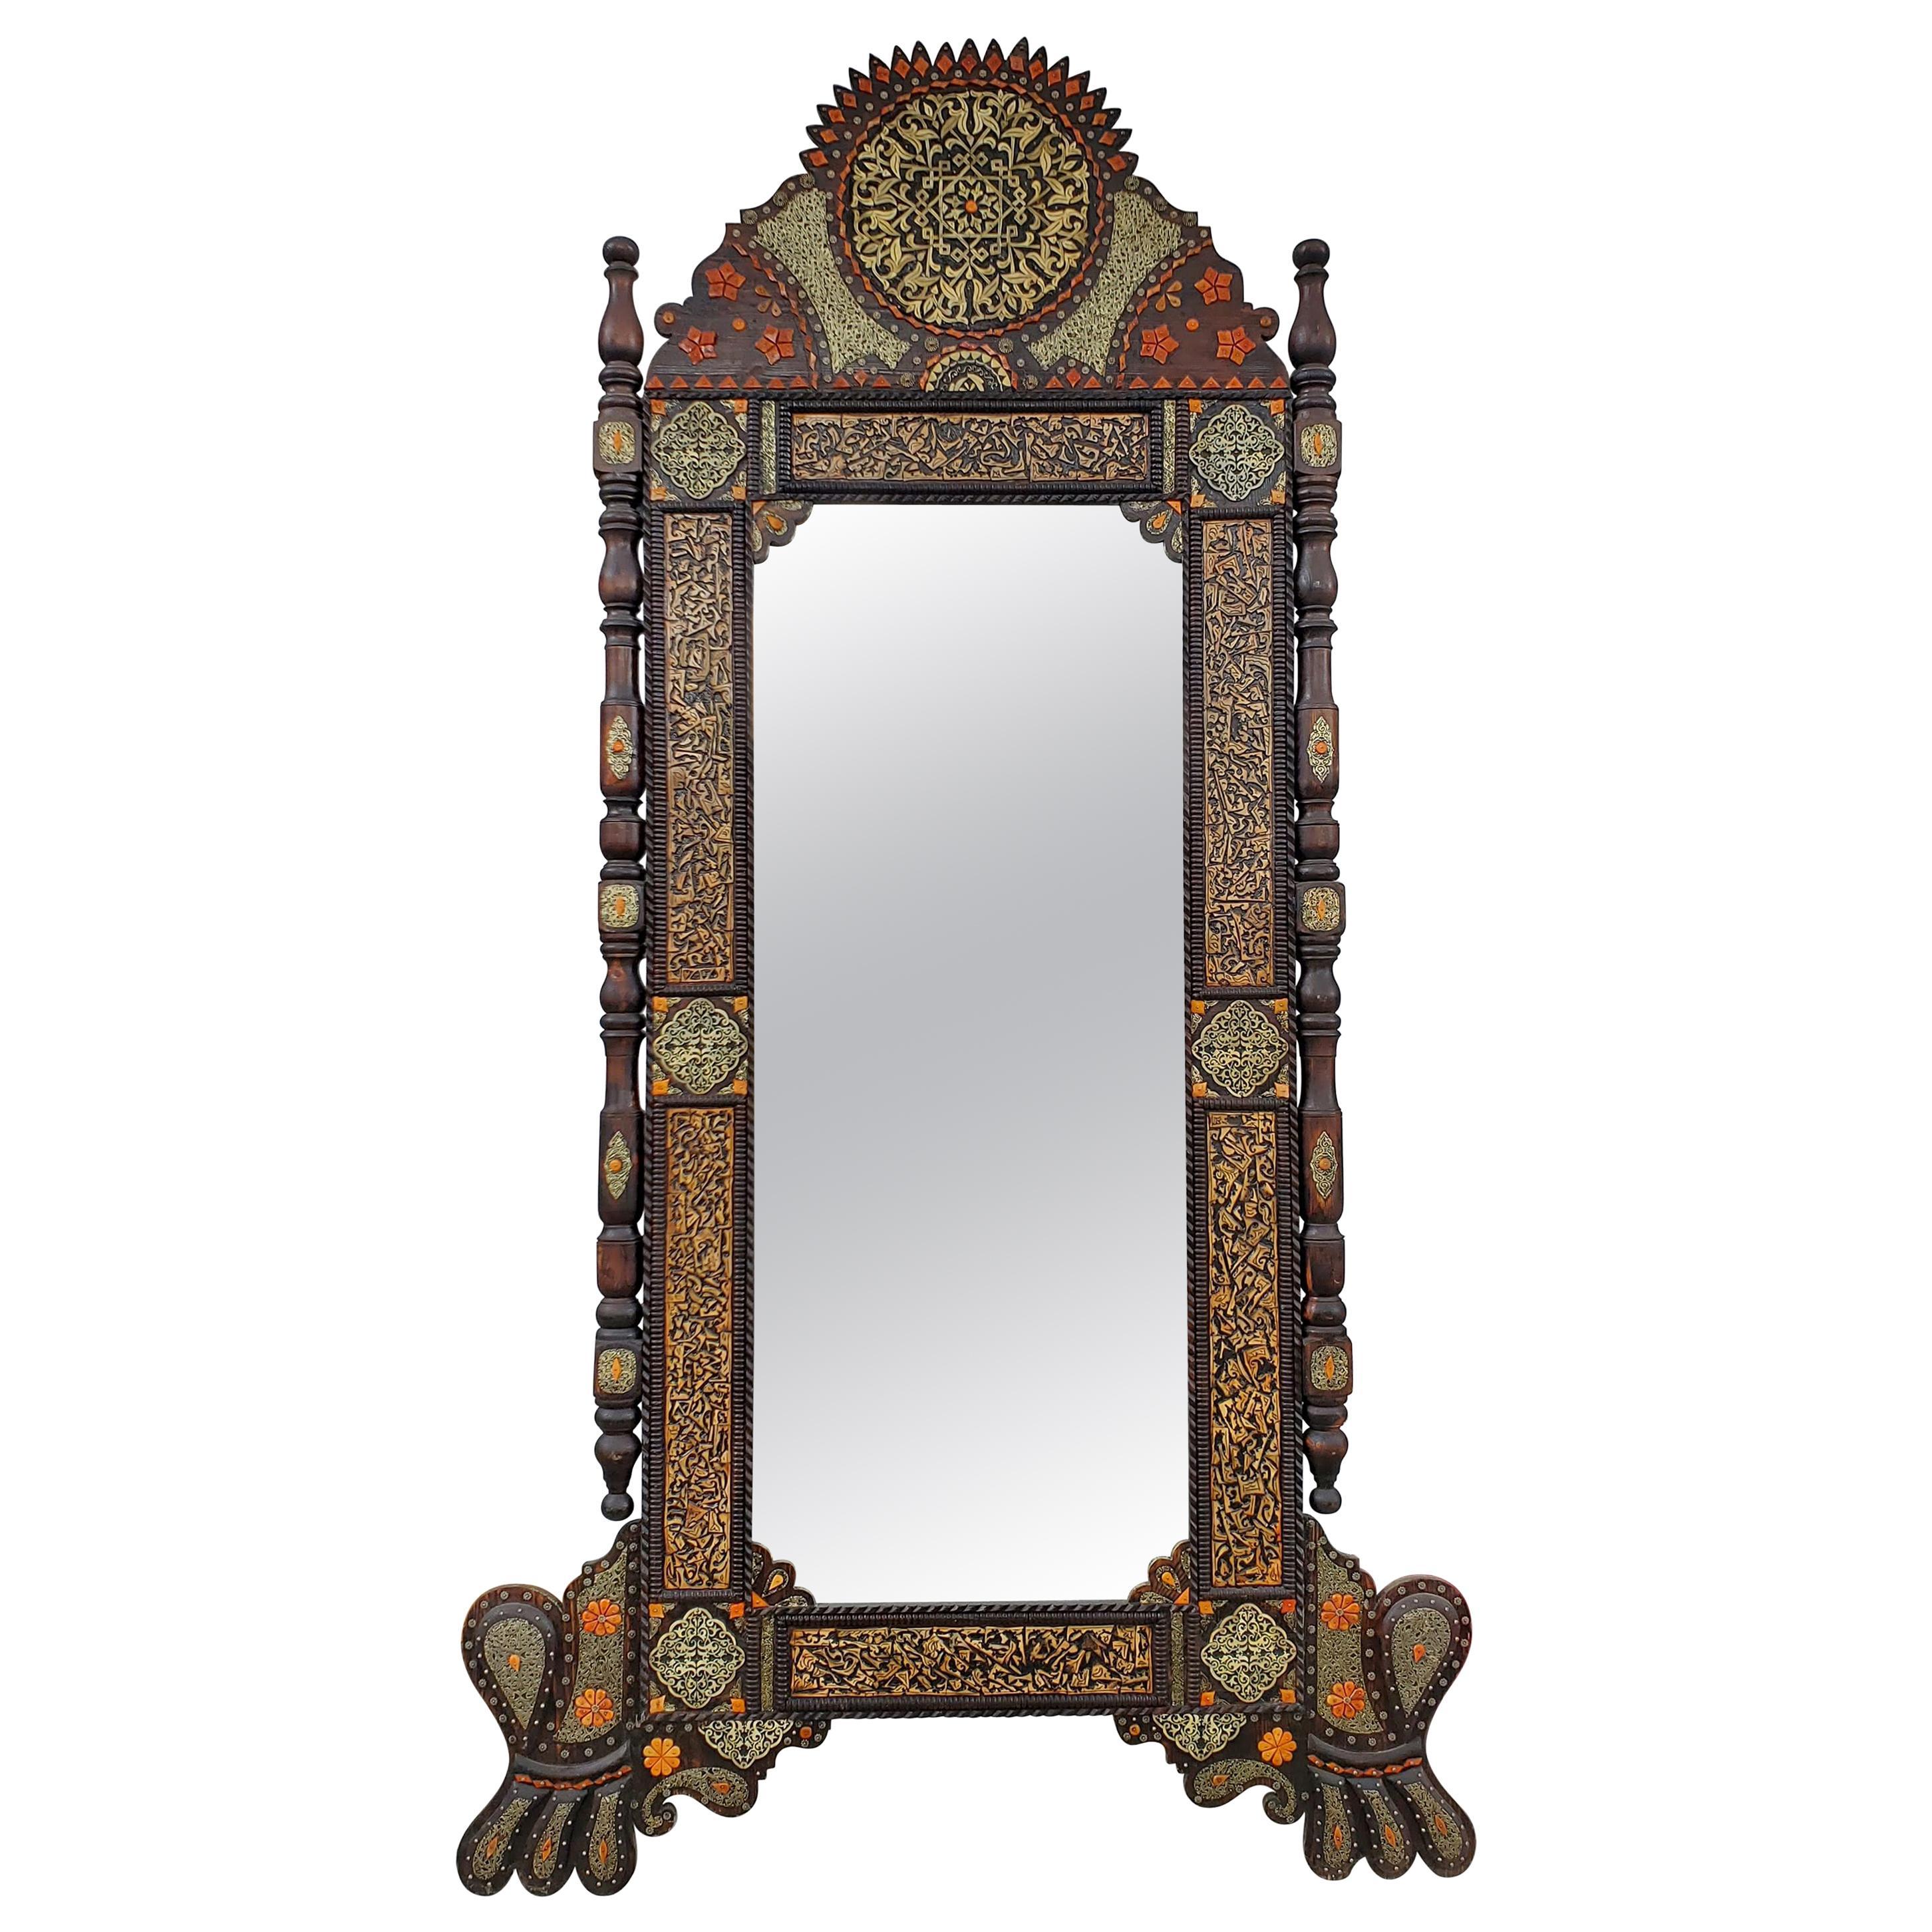 Superb Extra Large Vintage Moroccan Medallion Full Length Mirror At 1stdibs